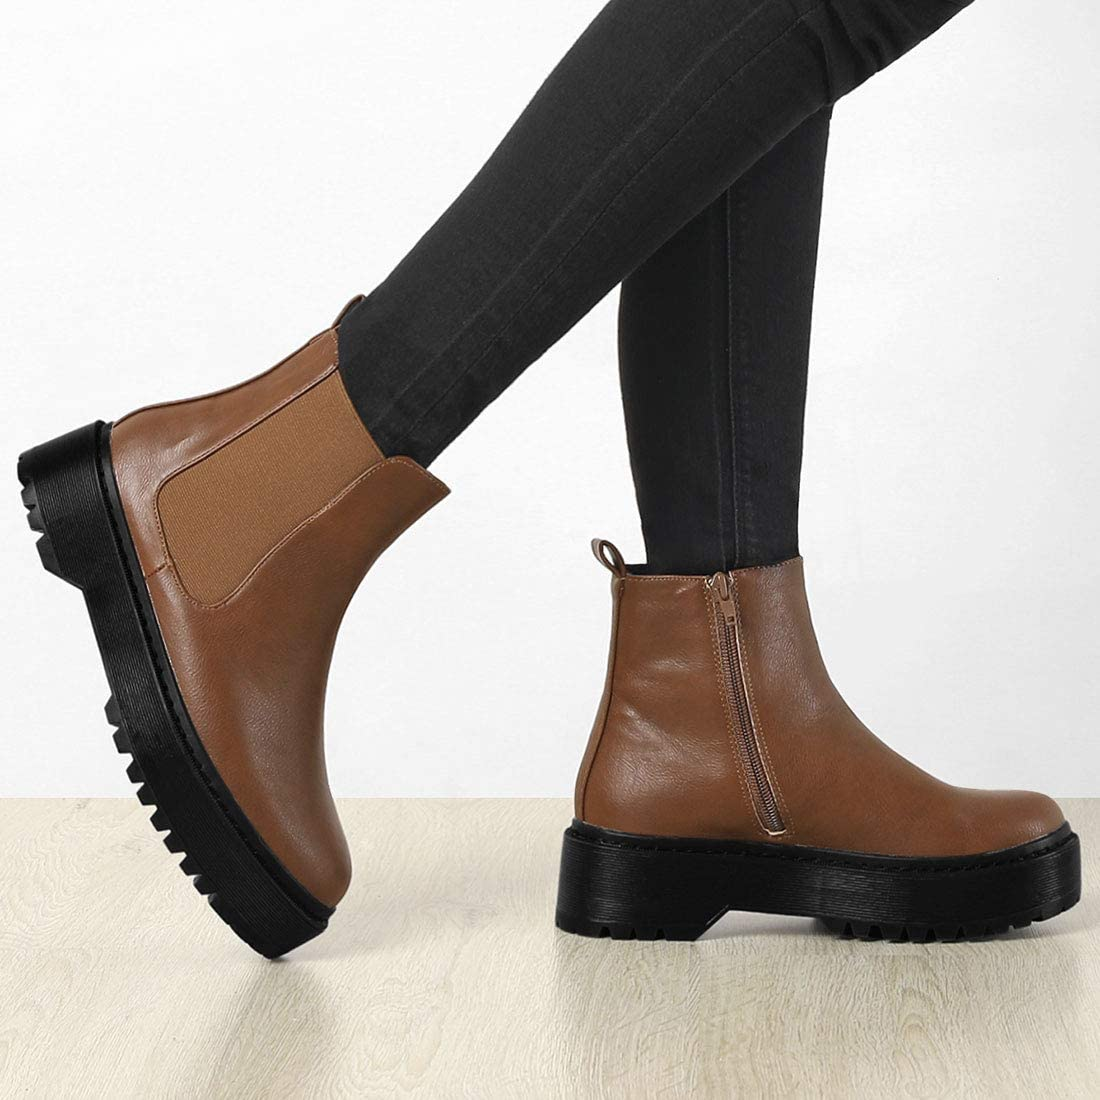 Allegra K Women's Chelsea Platform Ankle Boots